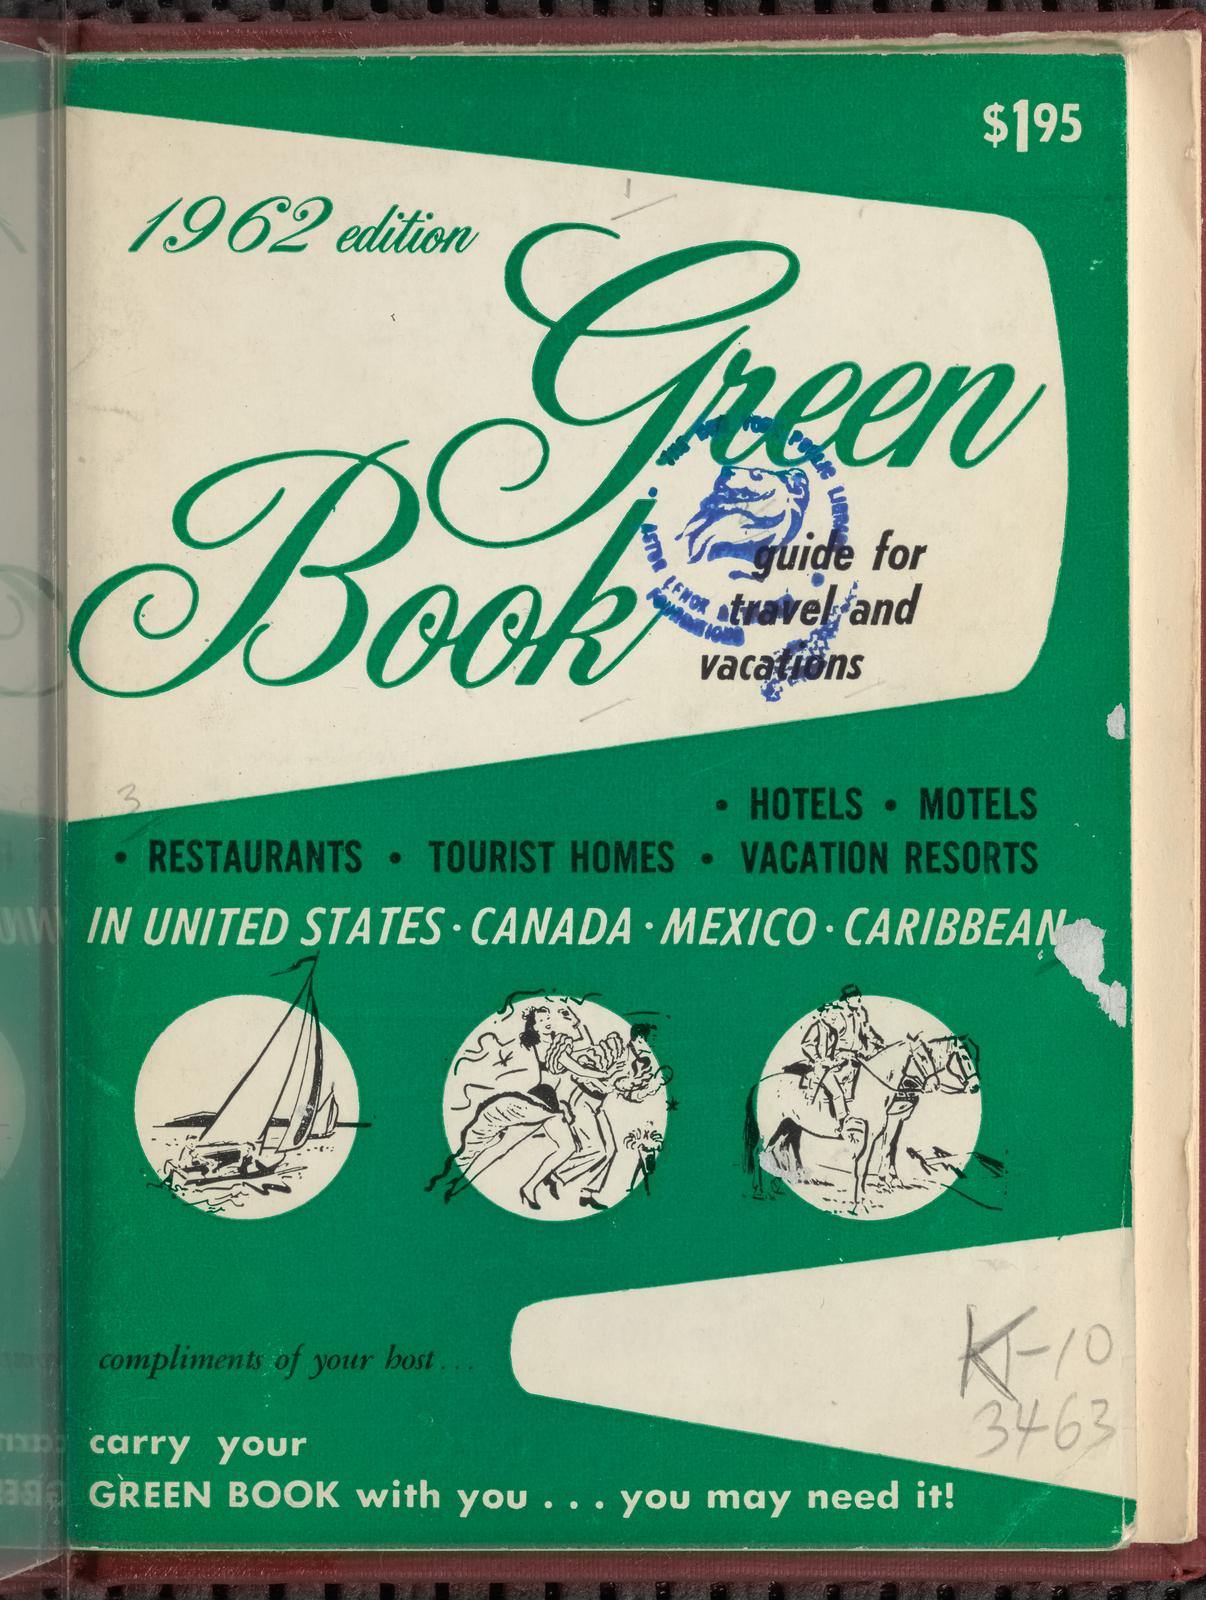 Green Book 1962